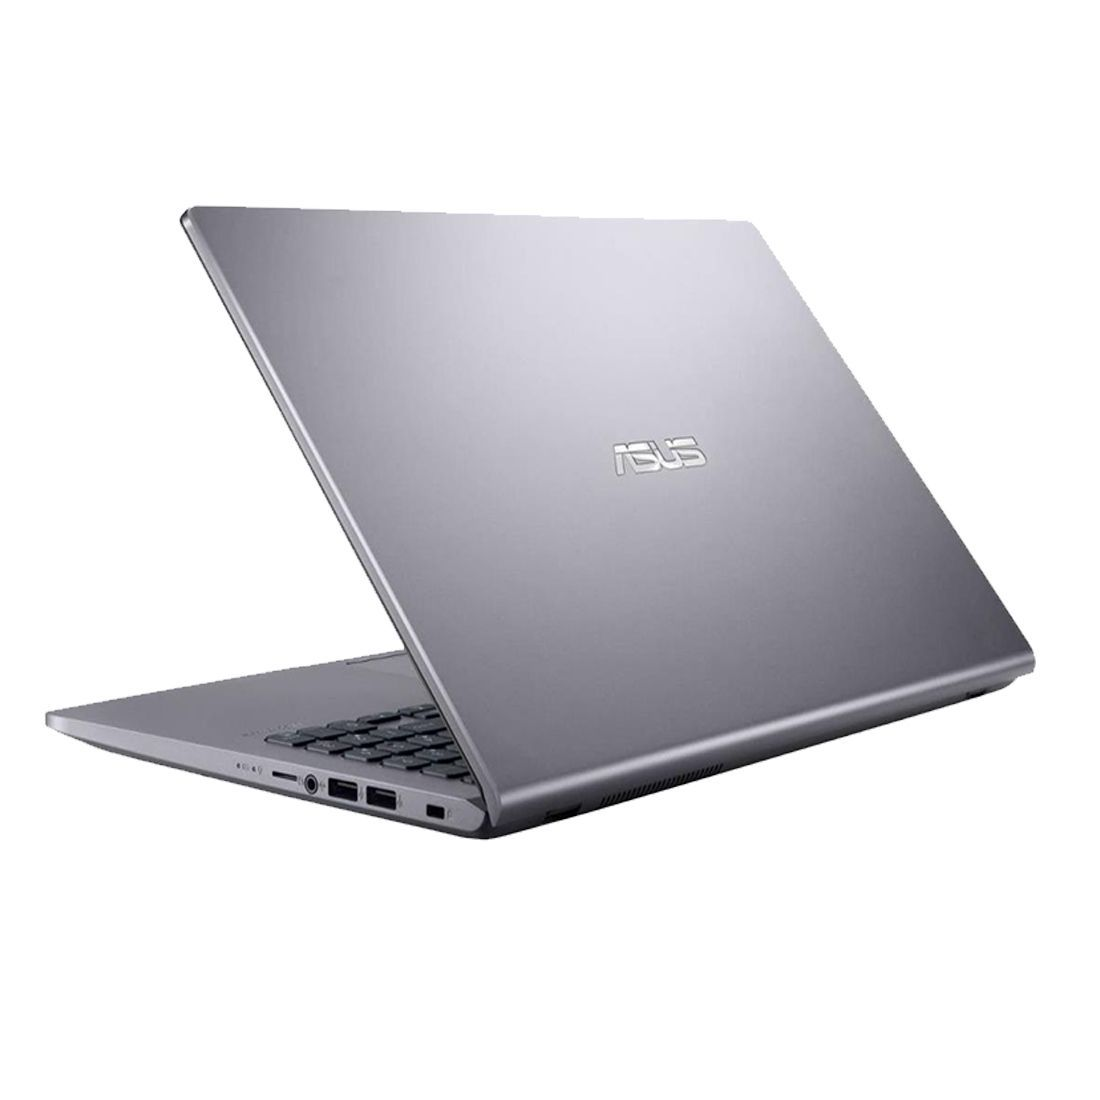 Asus Zenbook Flip Core I5 10210 Touch Convertible Laptop Review Business Laptop Asus Laptop Asus